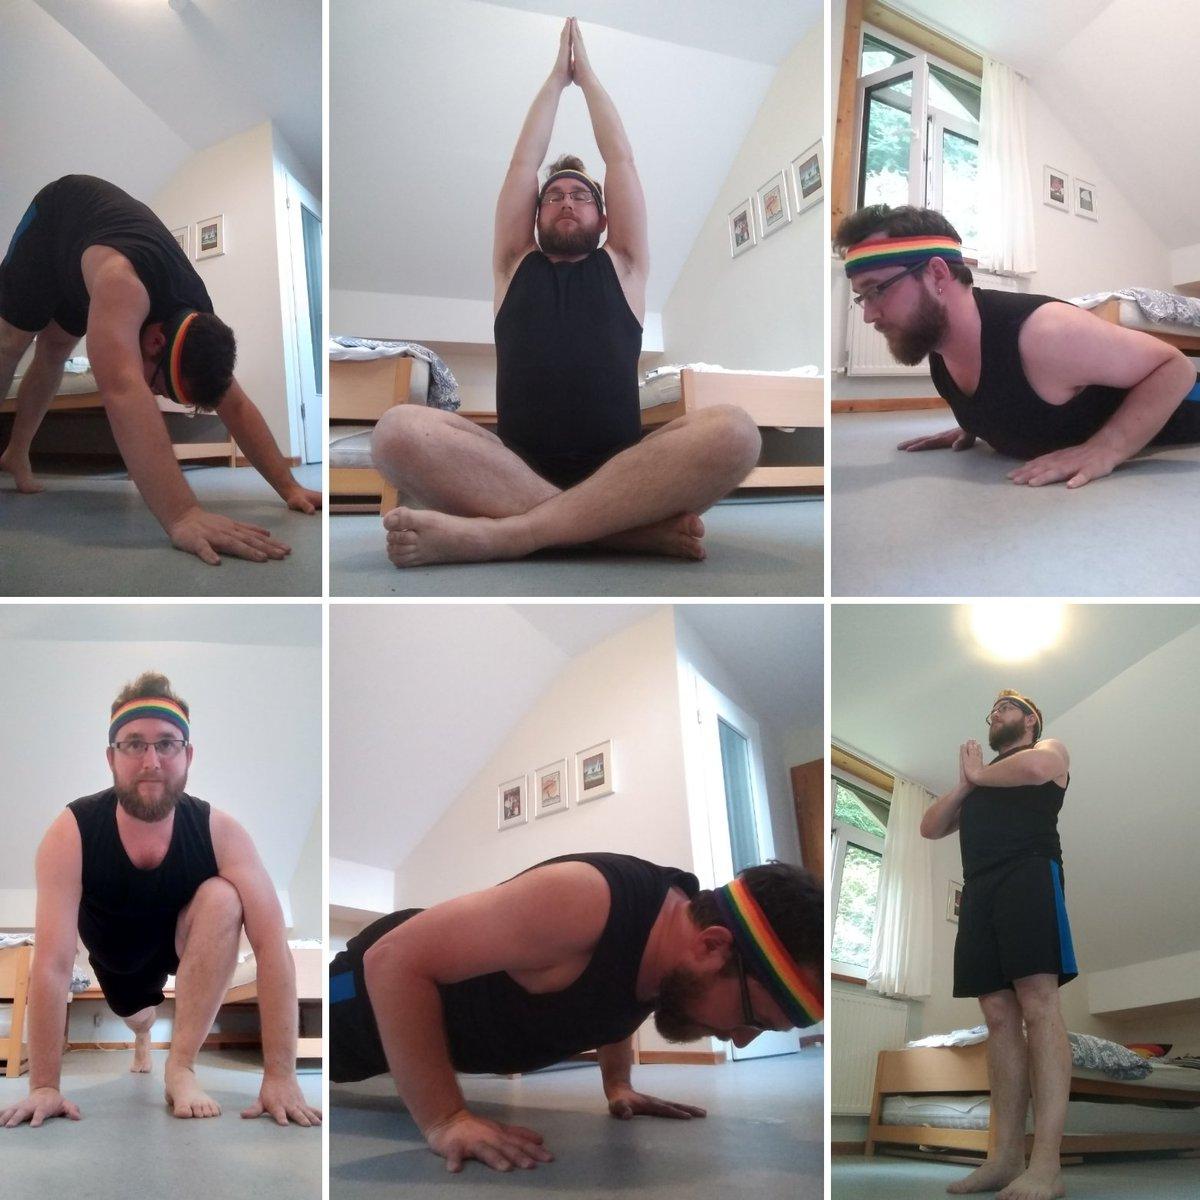 34 Sūrya Namaskāra  सूर्य नमस्कार  #yoga #SūryaNamaskāra #सूर्यनमस्कार #asana #spiceboy #sportyspice #sports #waldschlösschen #akademiewaldschlösschen #aidshilfe https://t.co/TYxN2yN0br